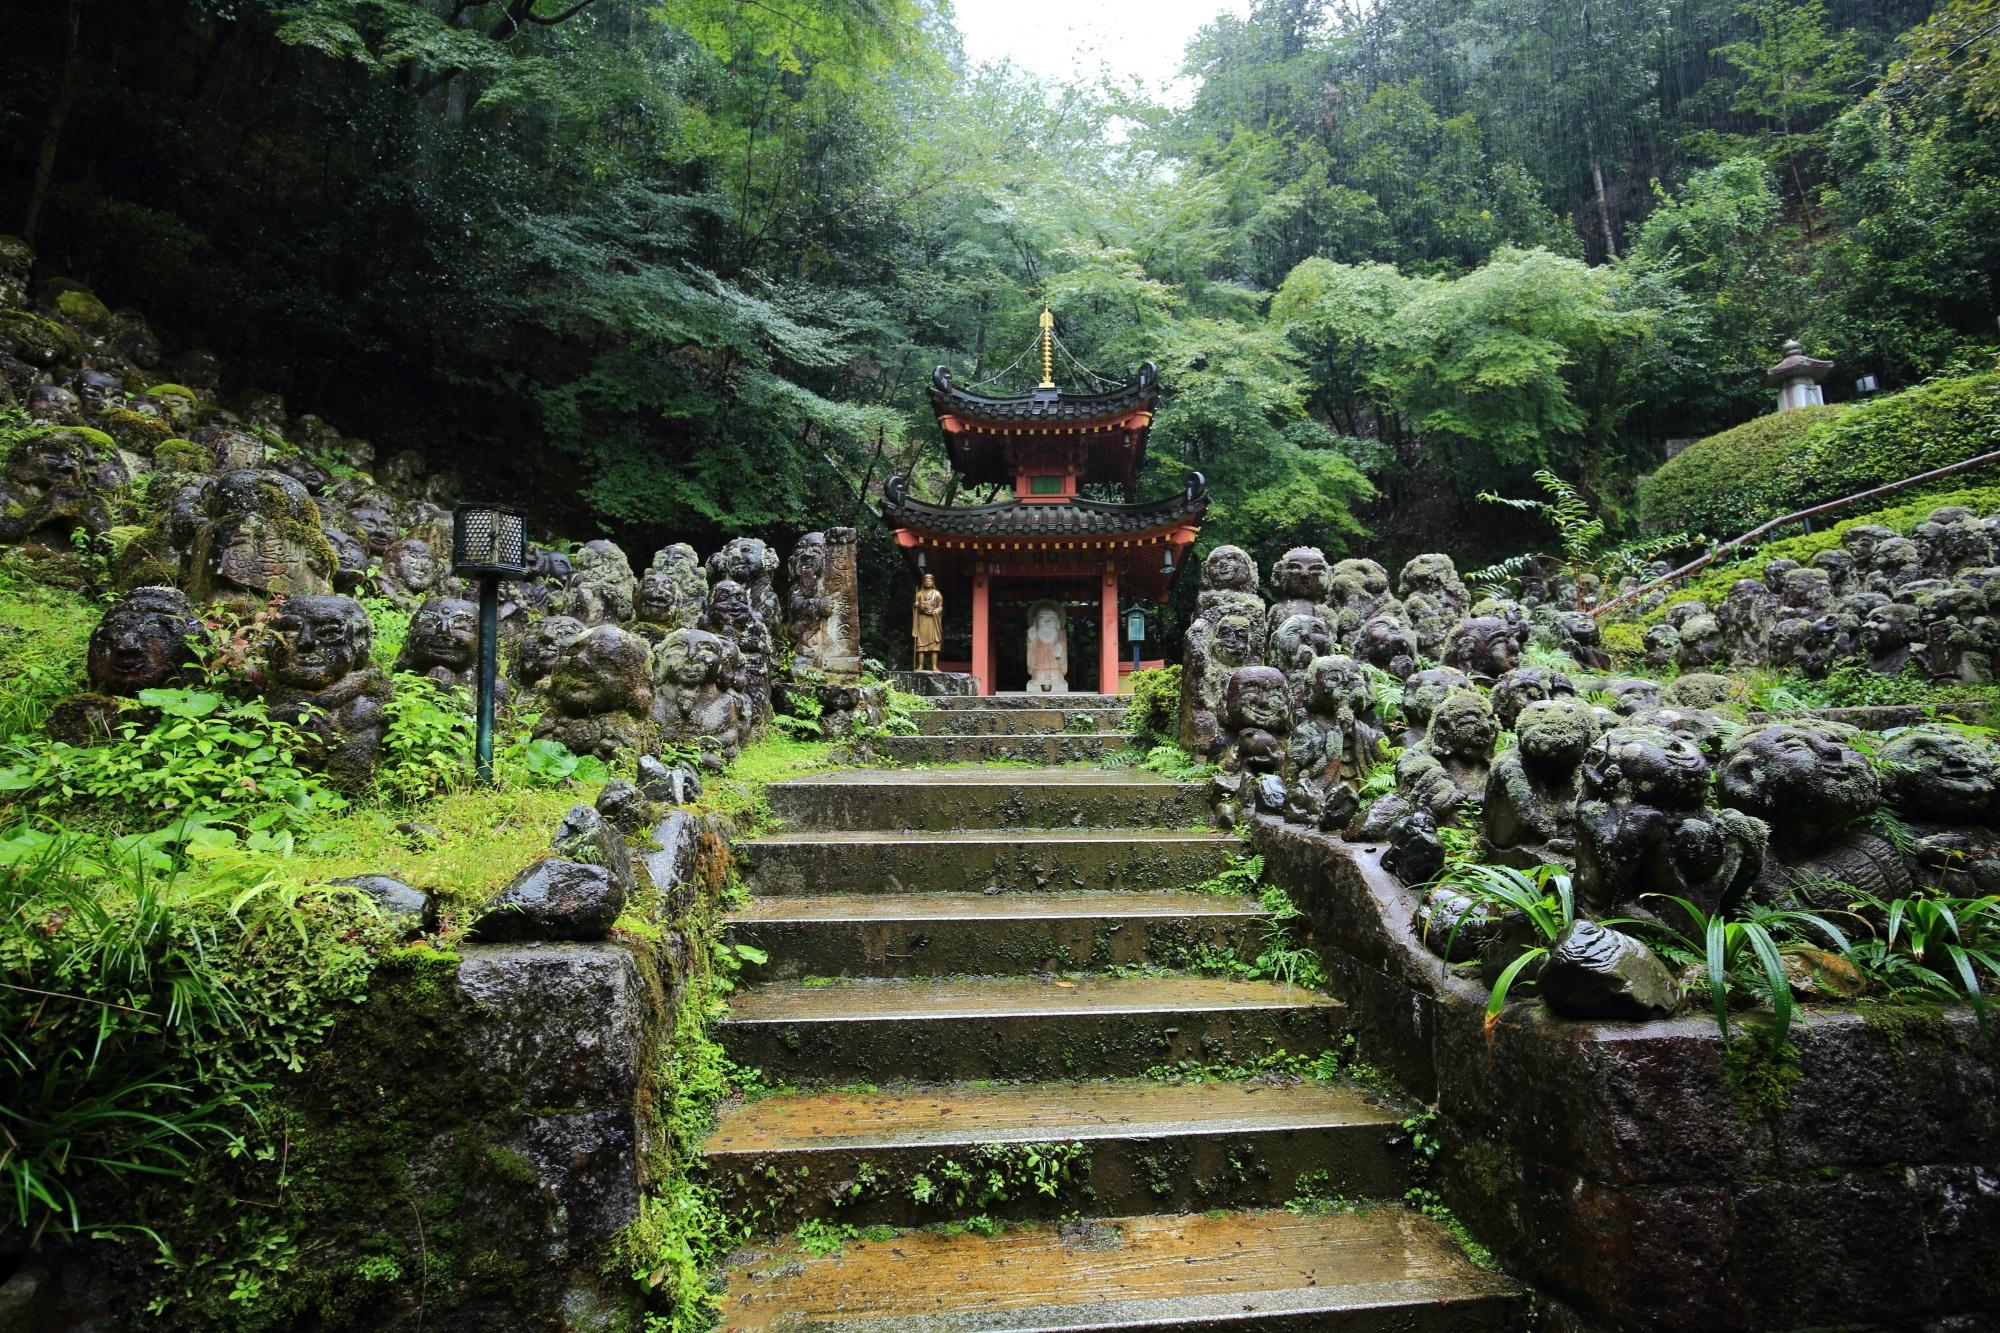 愛宕念仏寺の多宝塔